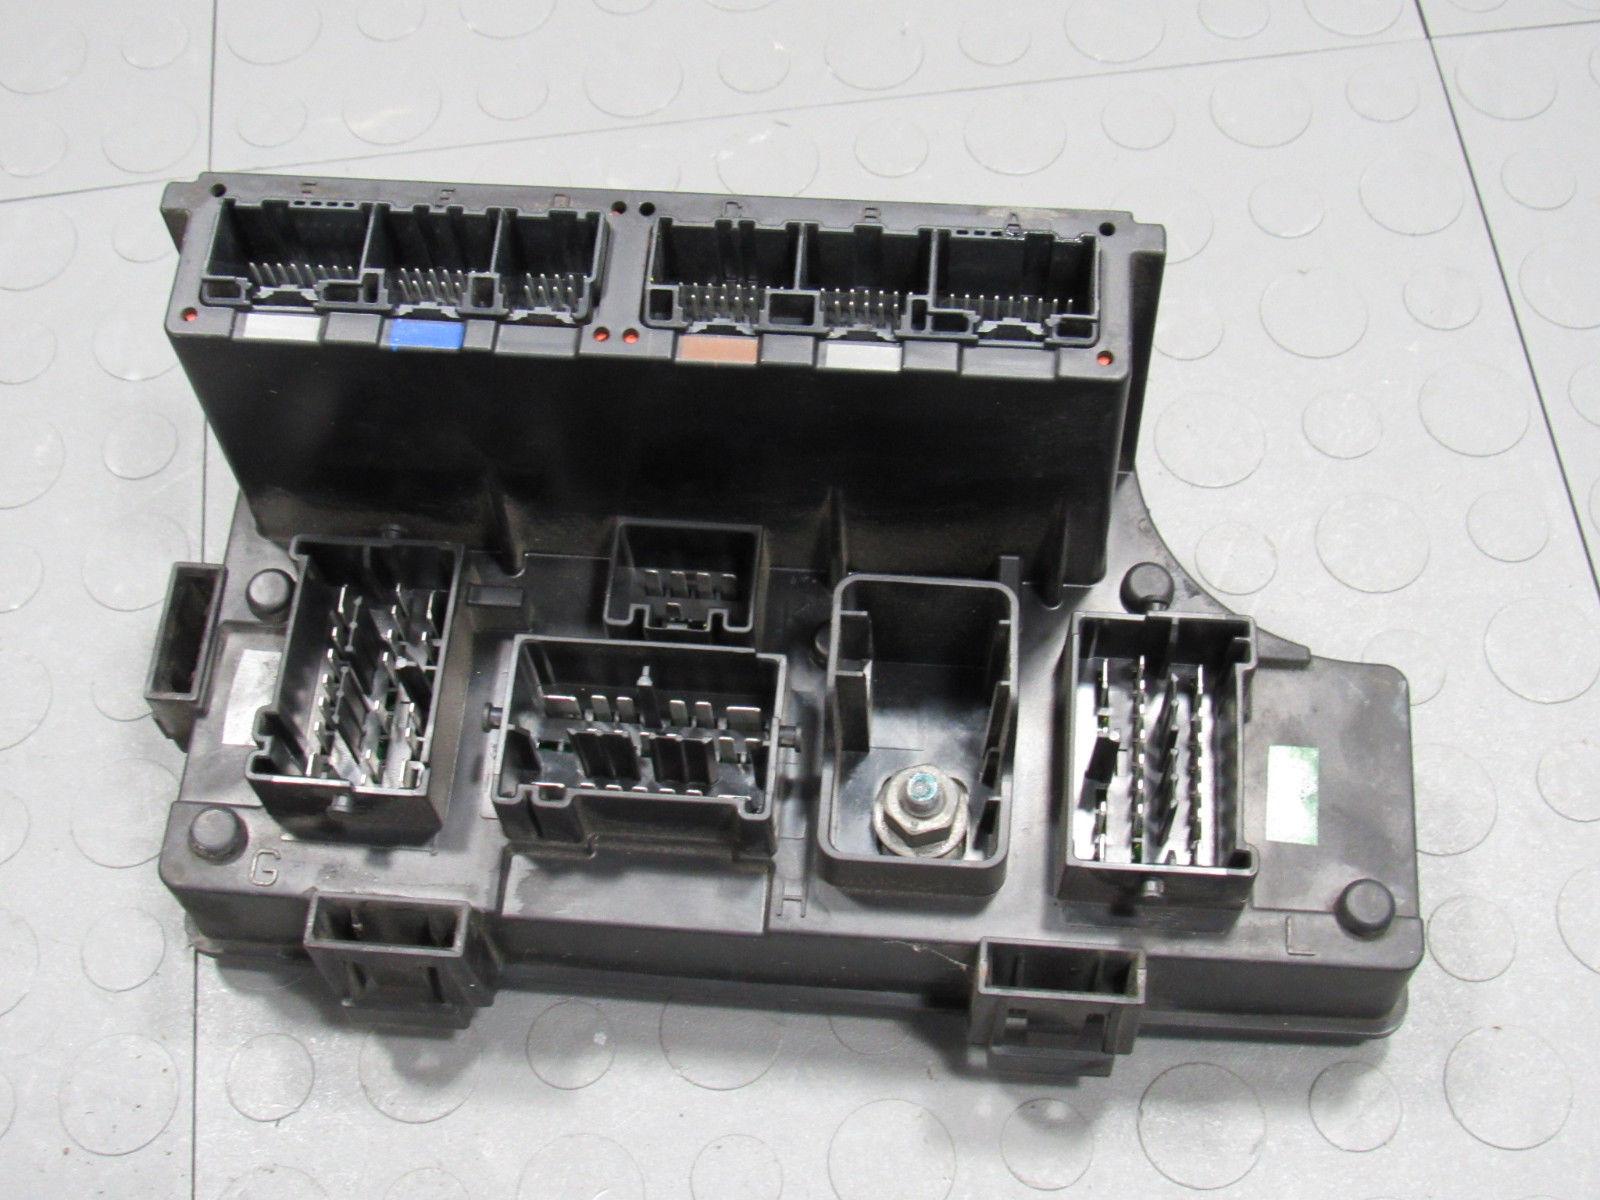 06-10 PT Cruiser TIPM BCM Totally Integrated Power Module Fuse Box  56049719AP CJ